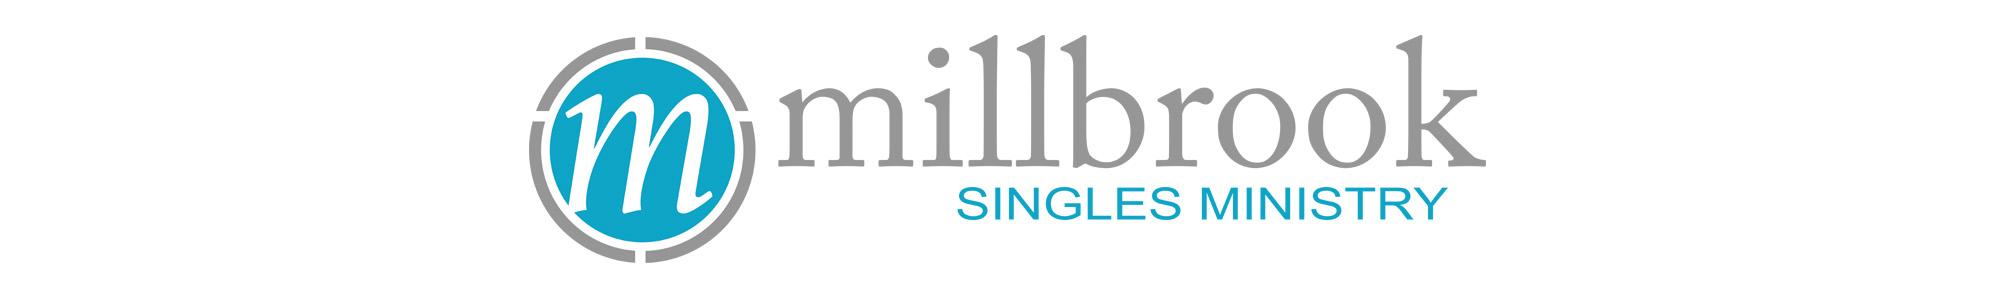 SinglesMinistry